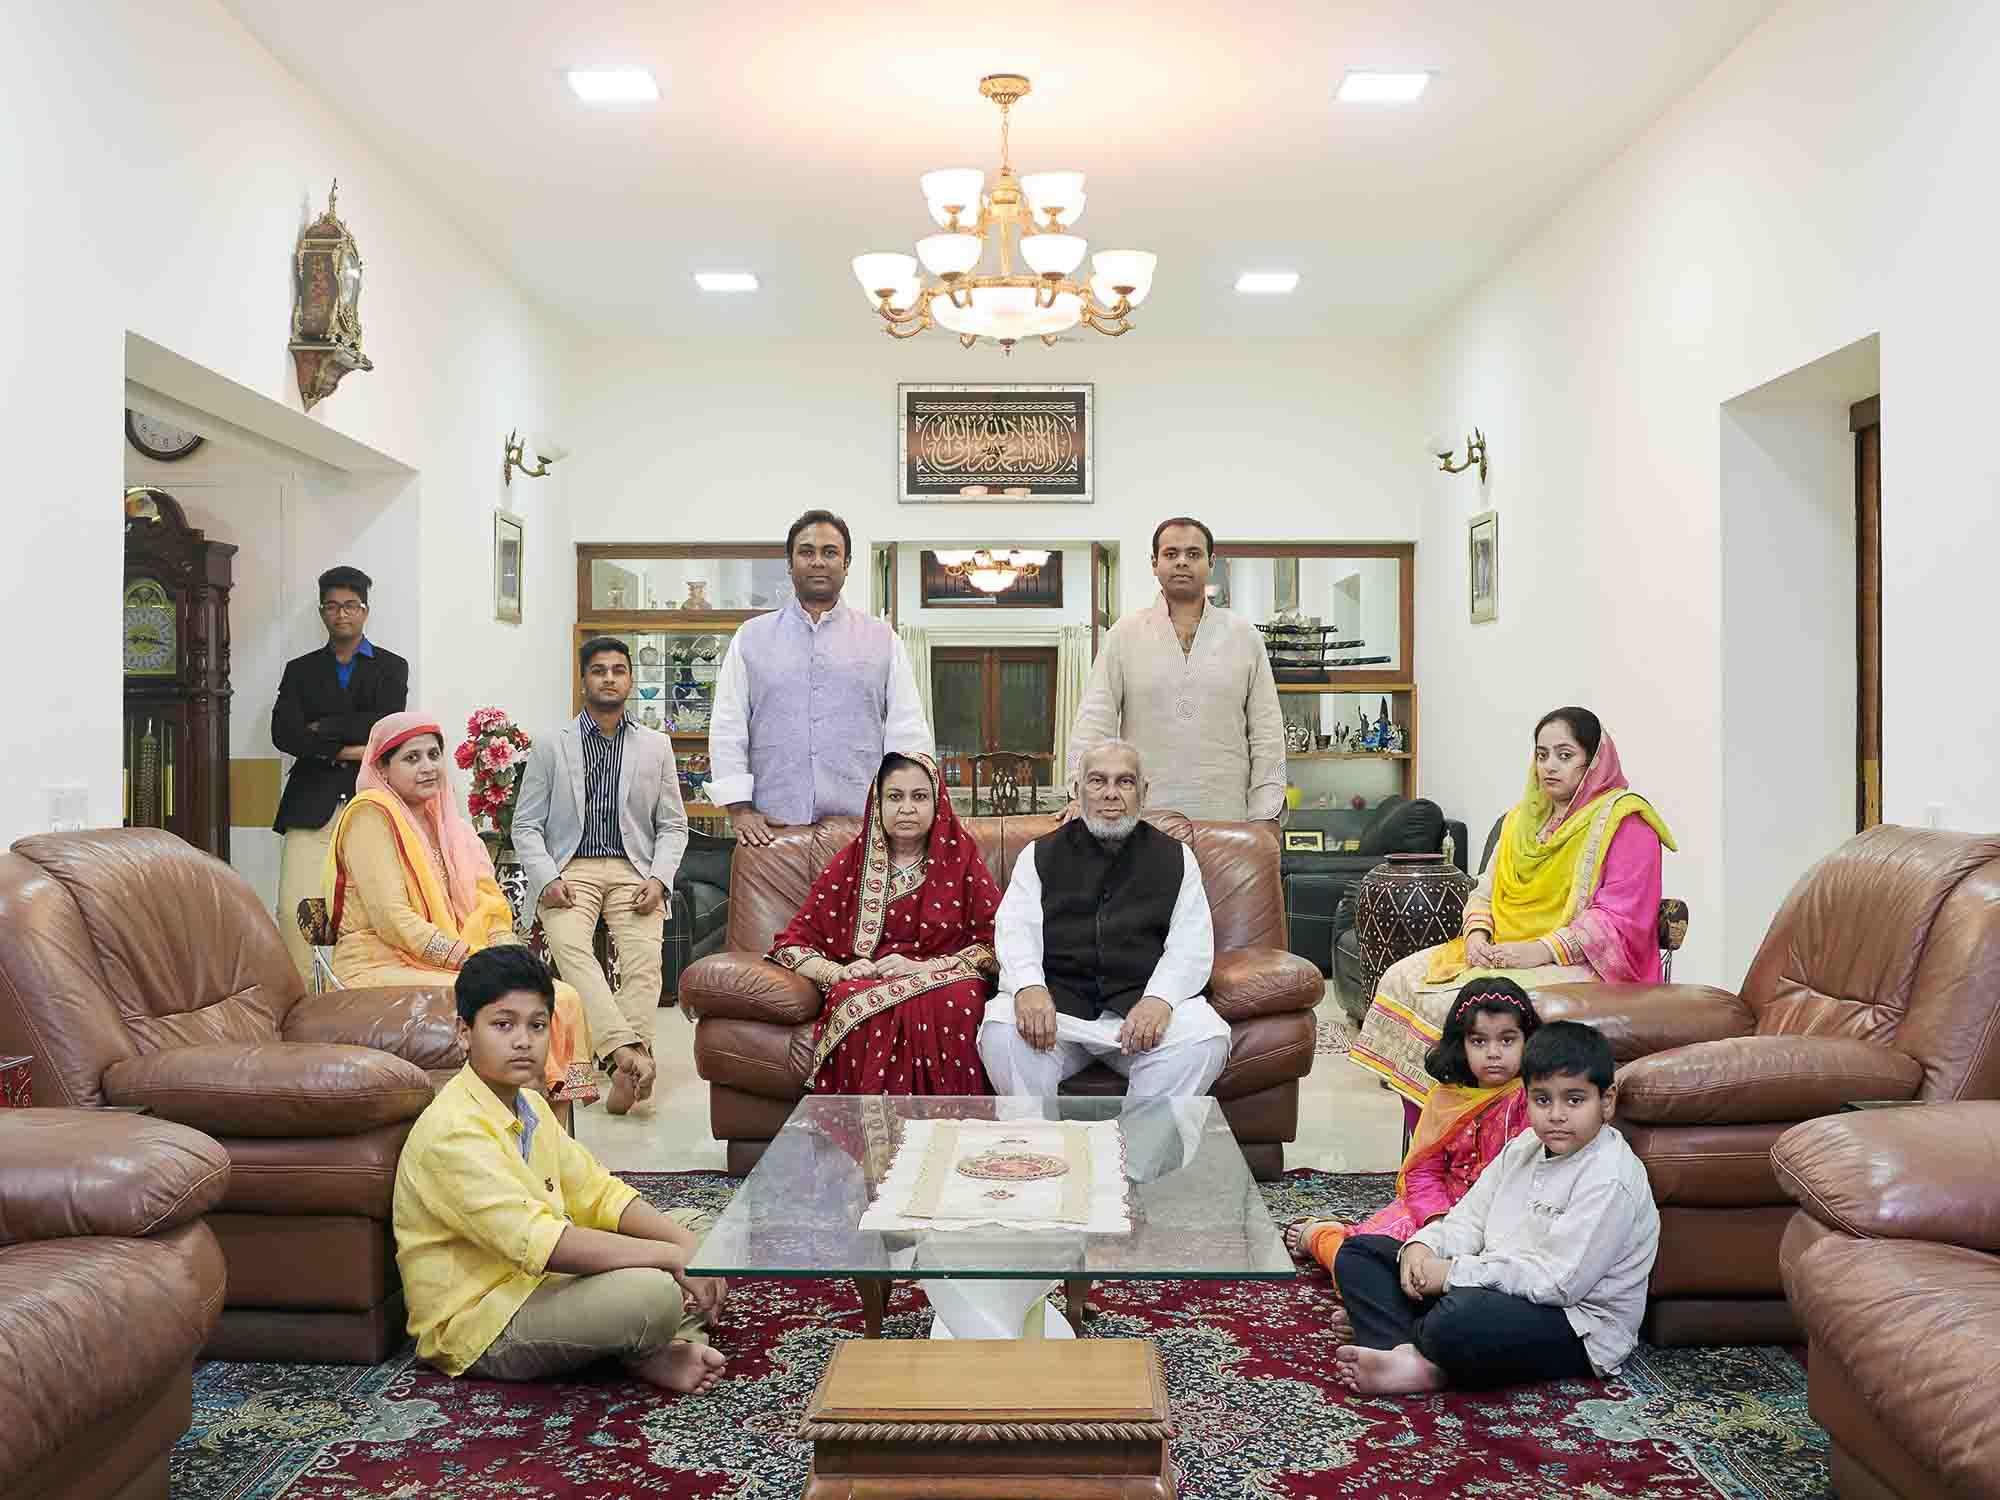 Nora Bibel, Suhail, Bangalore, Indien, 2015. Aus der Serie Family Comes First